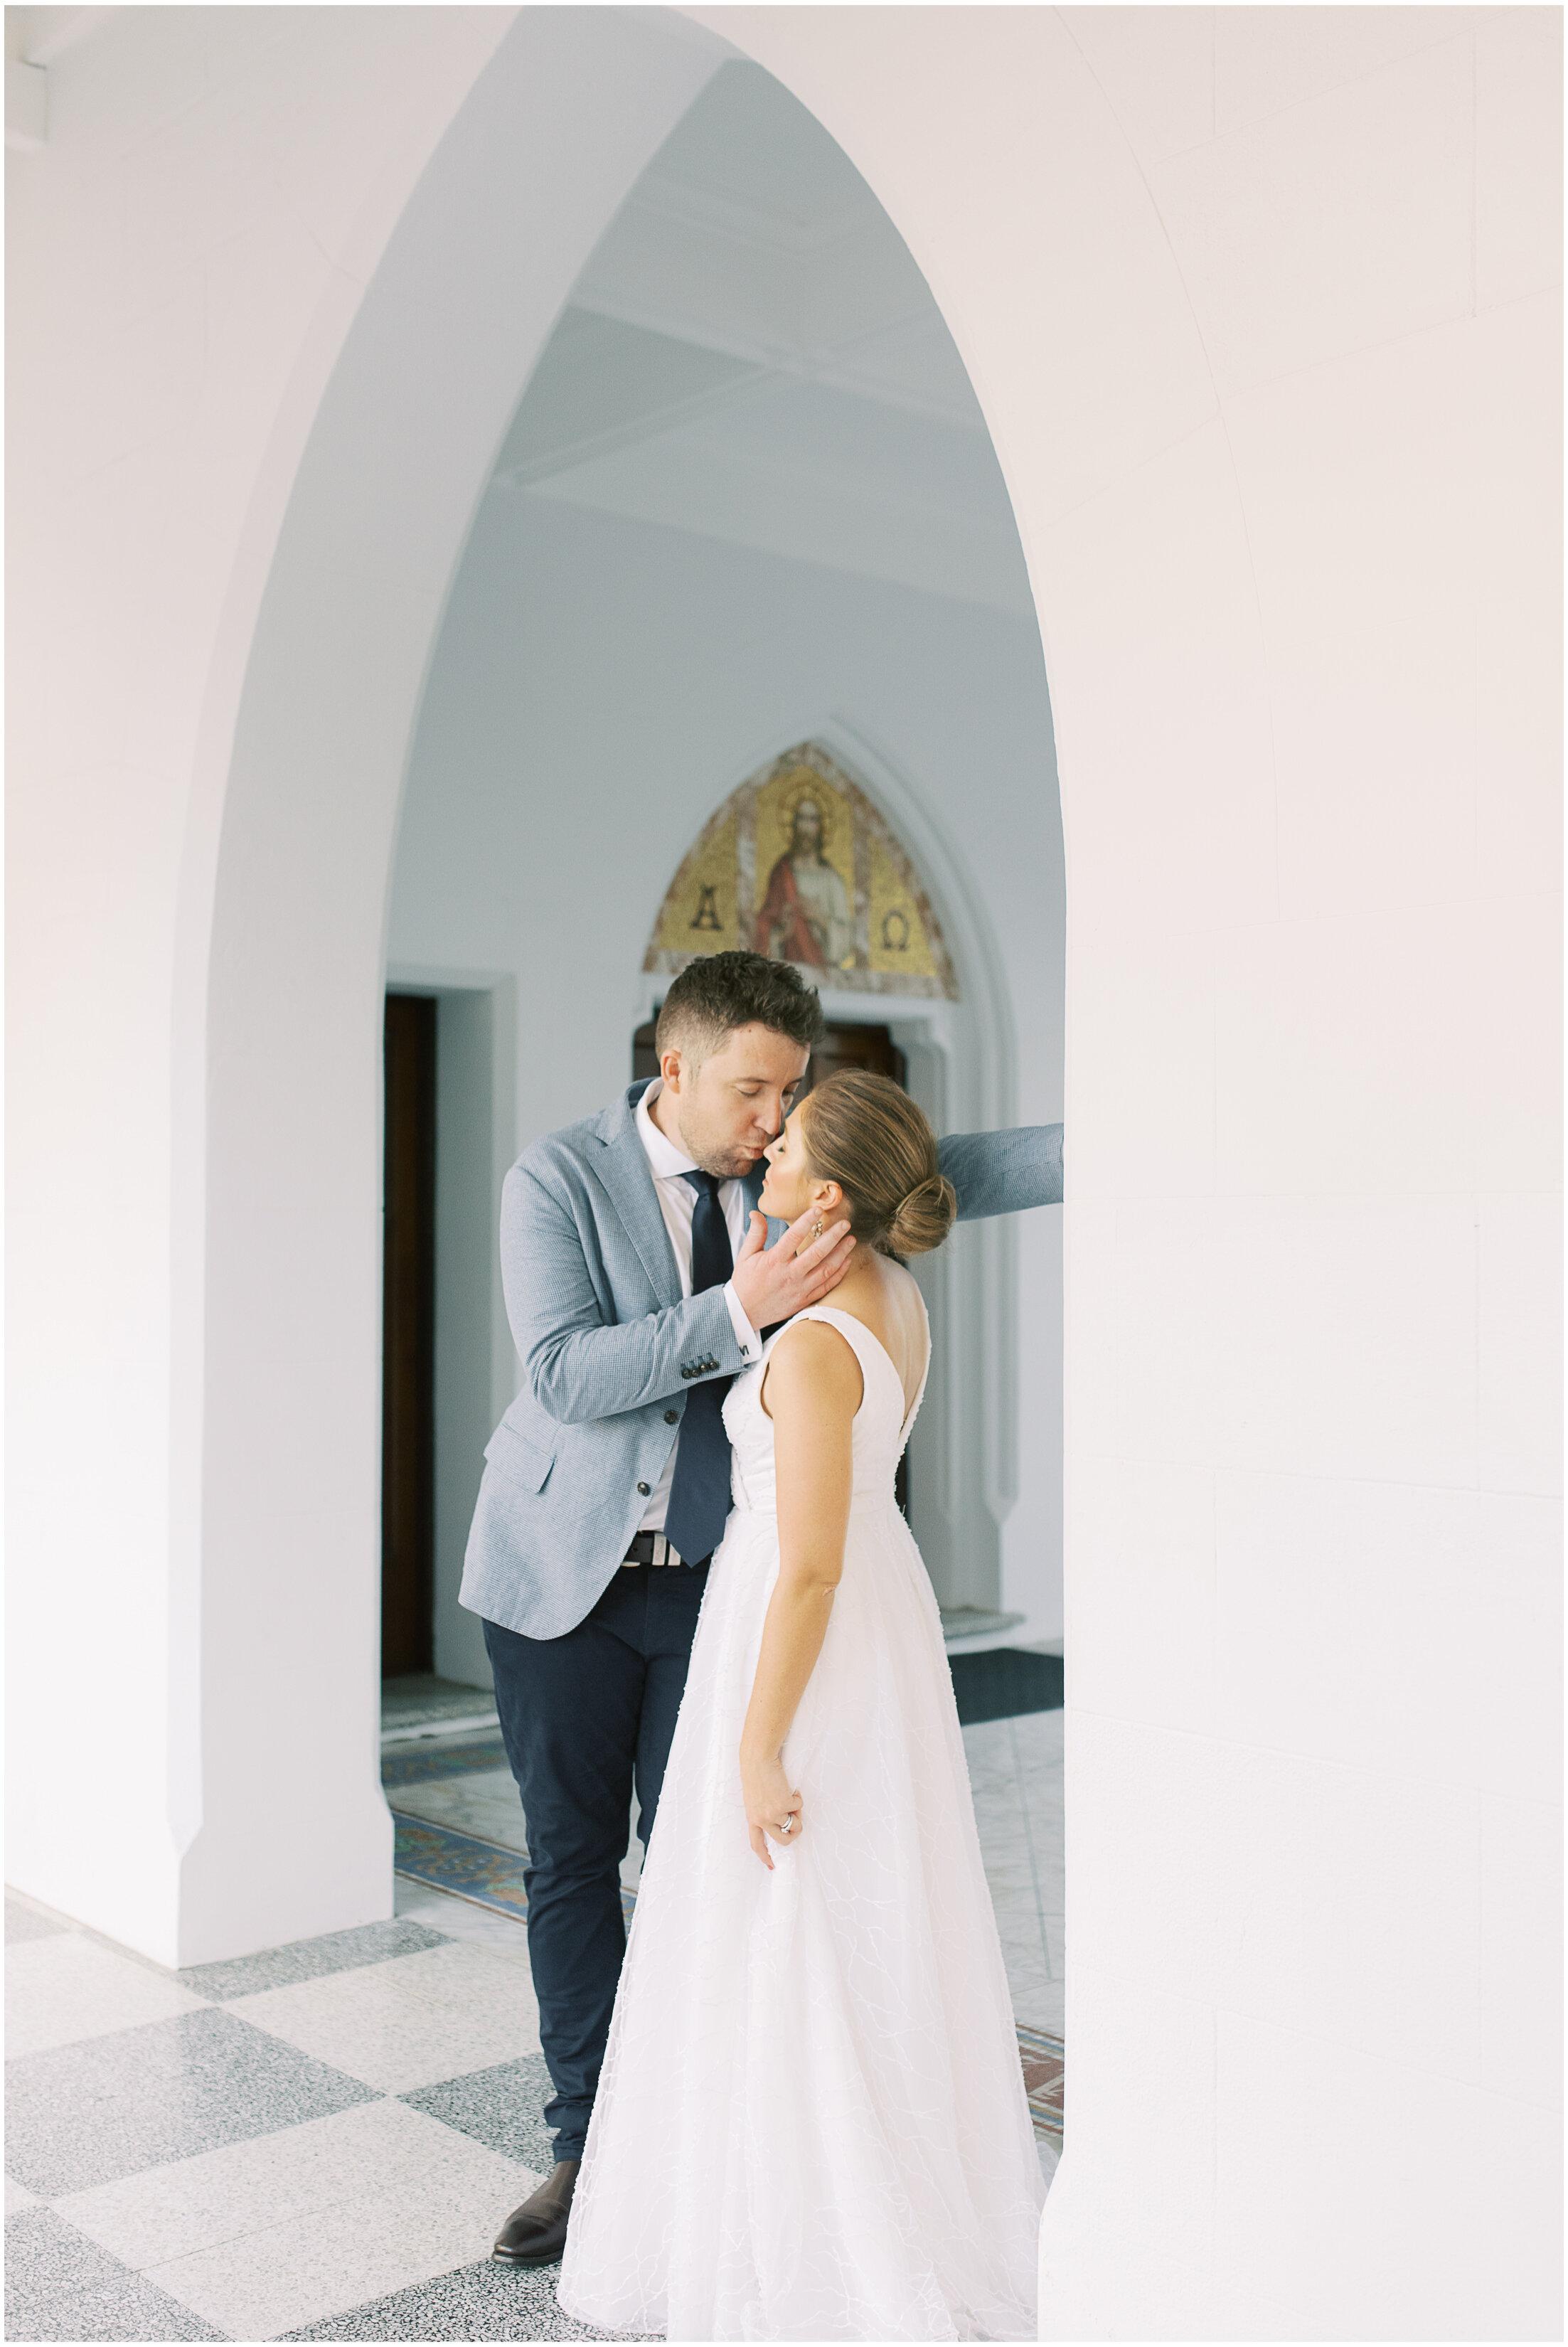 refinery-brisbane-wedding-photography-film-photographer-fine-art-33.jpg